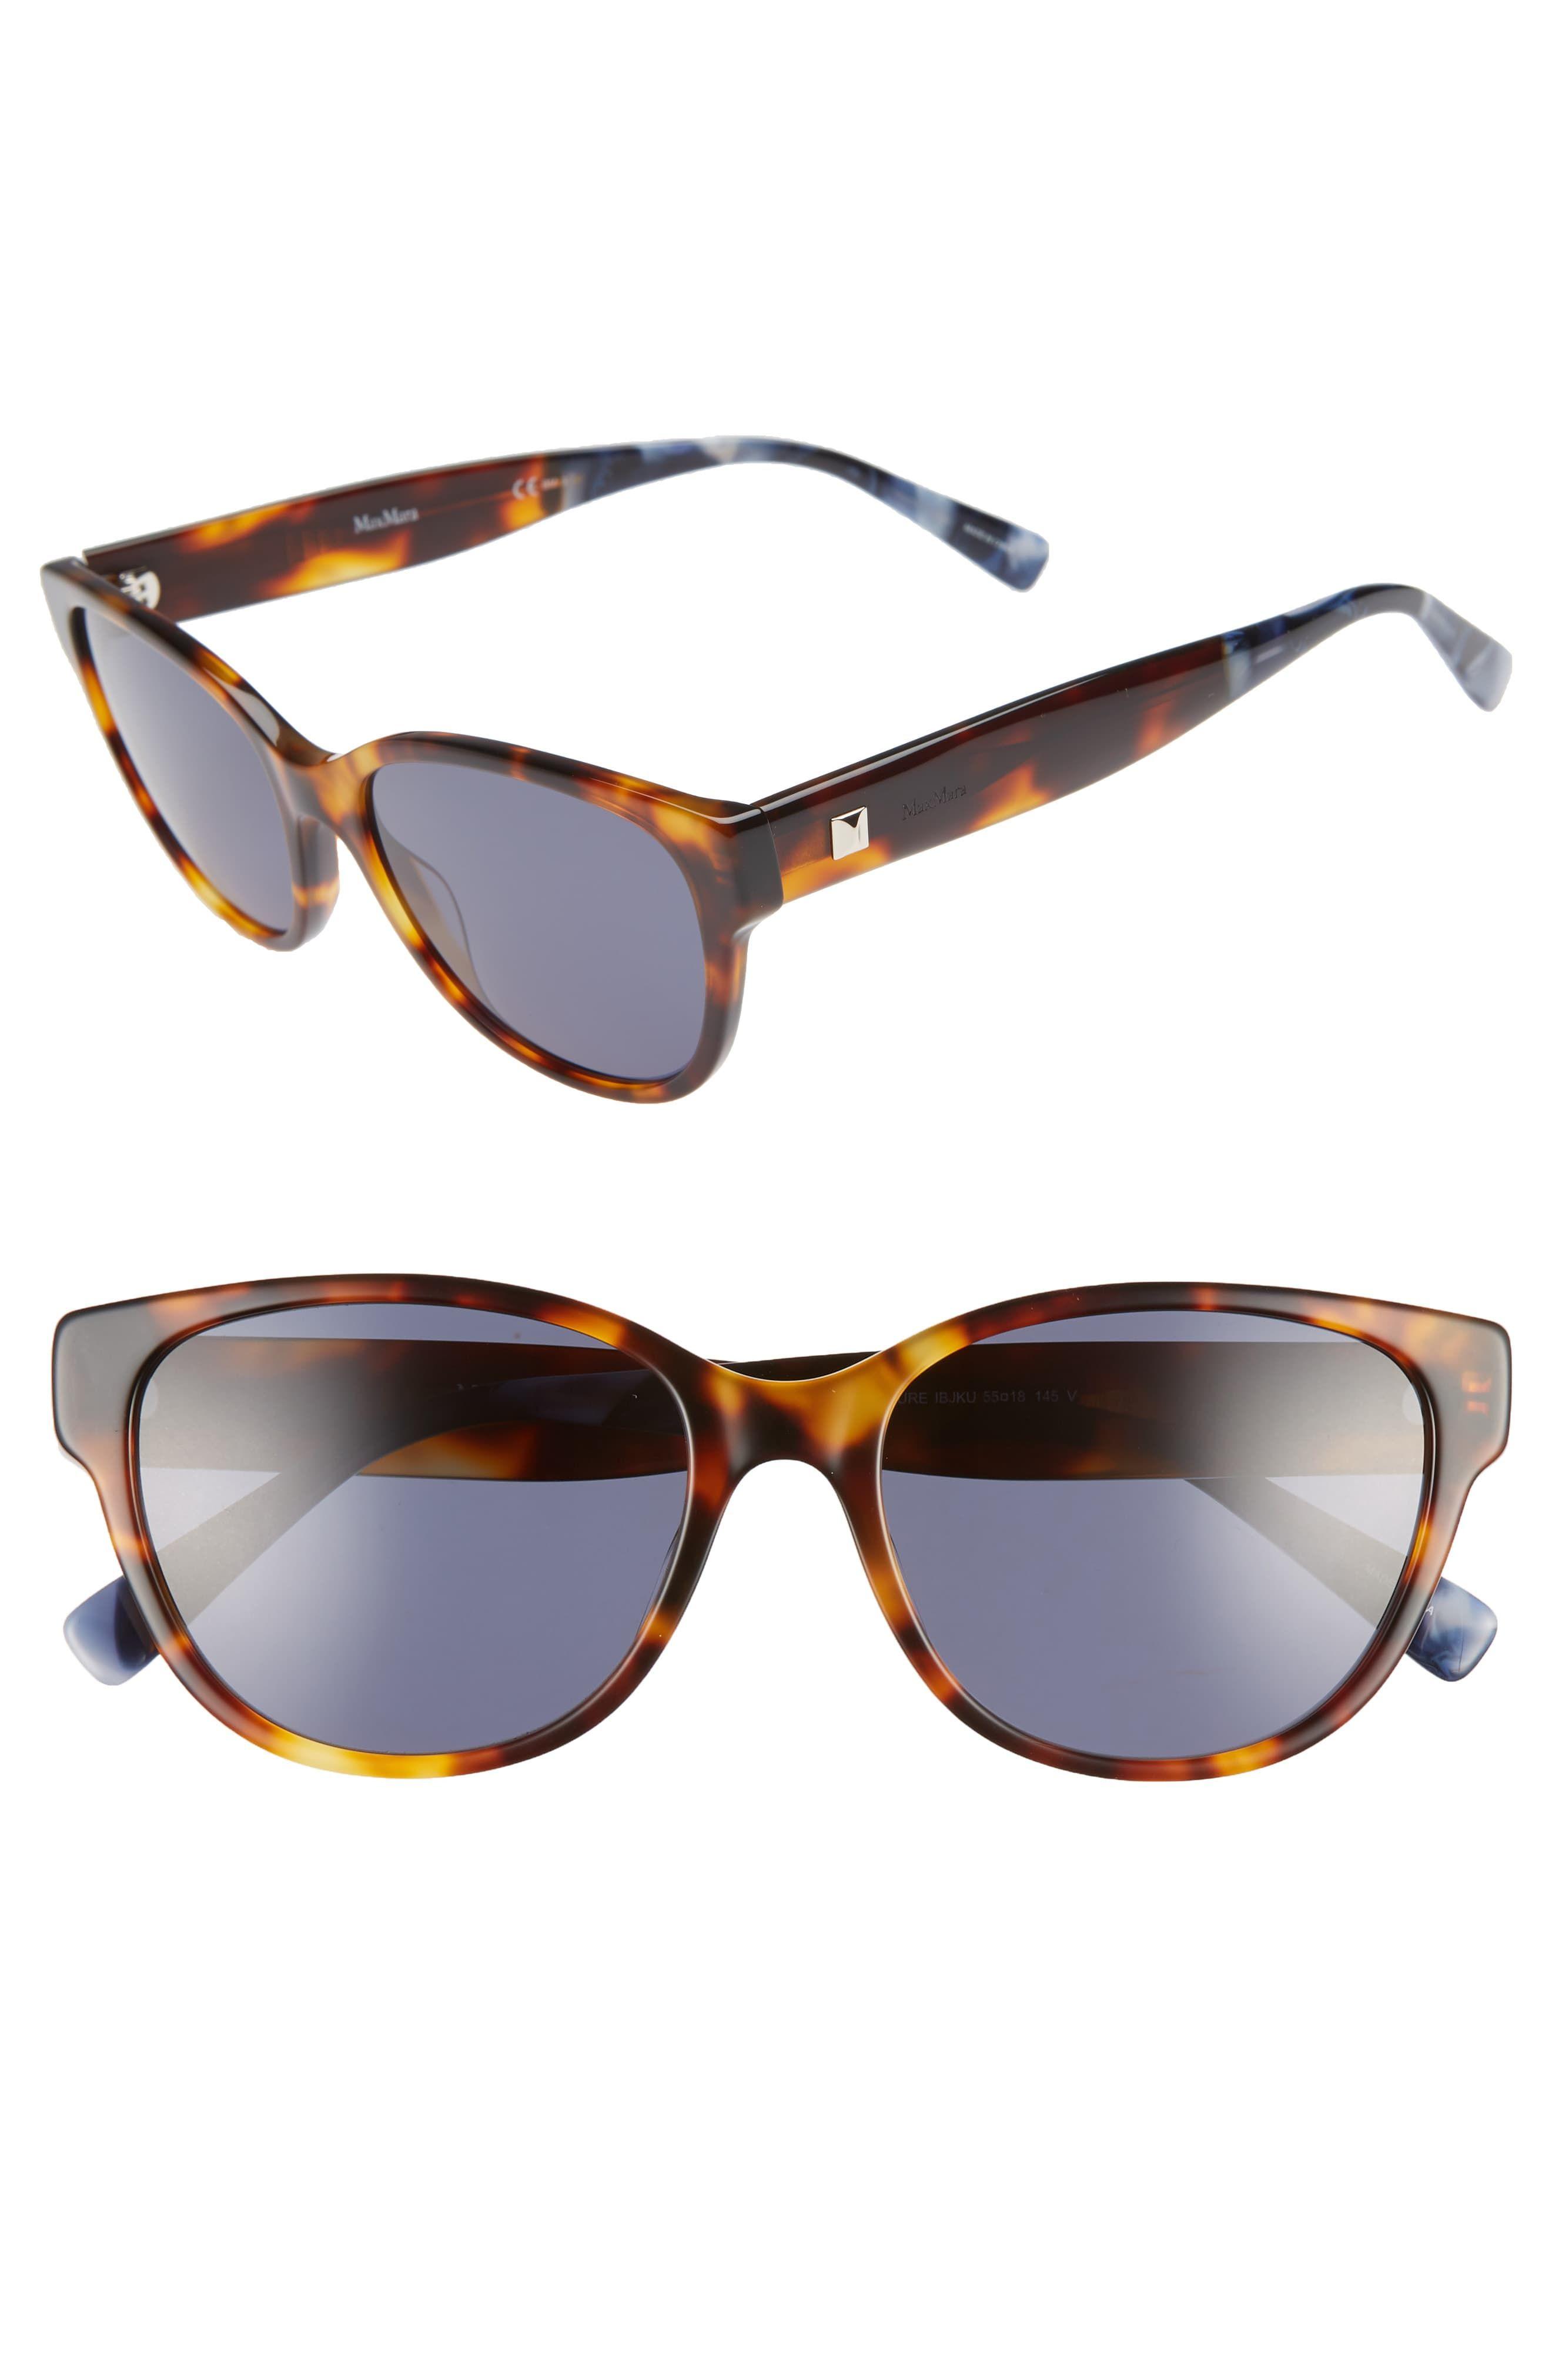 6e5f48b86480 Women's Max Mara Leisure 55Mm Cat Eye Sunglasses - Black in 2019 ...